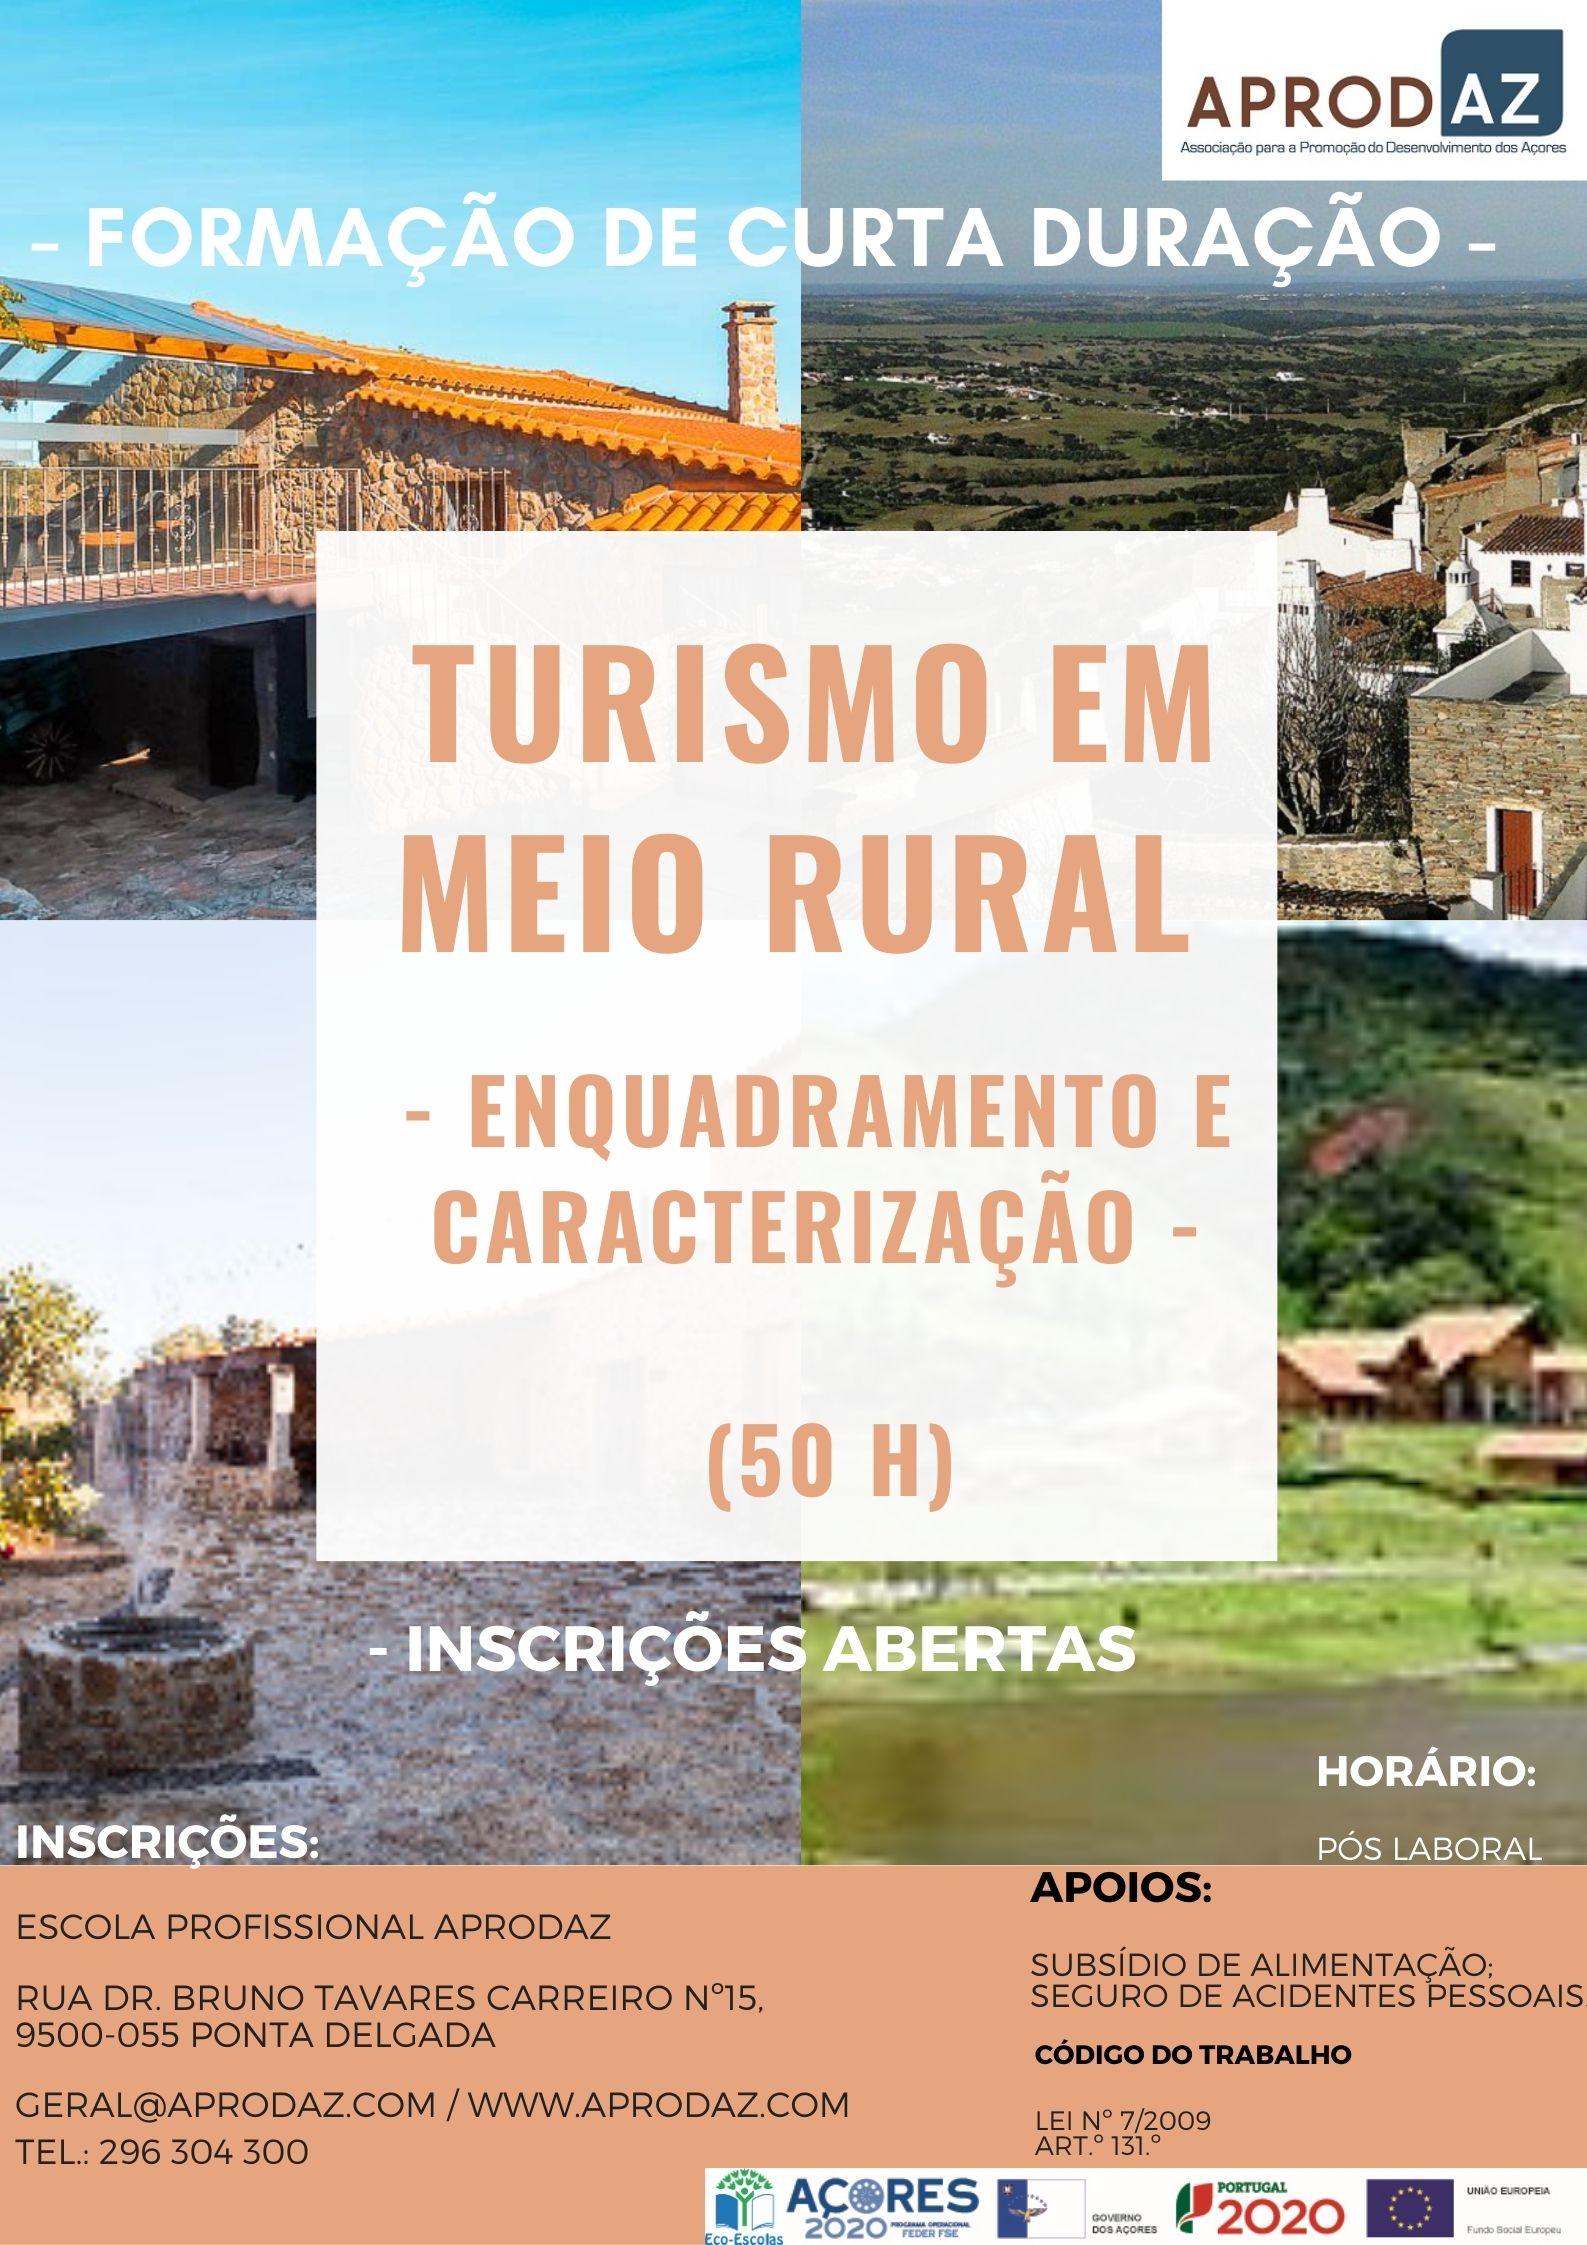 turismo-em-meio-rural.jpg